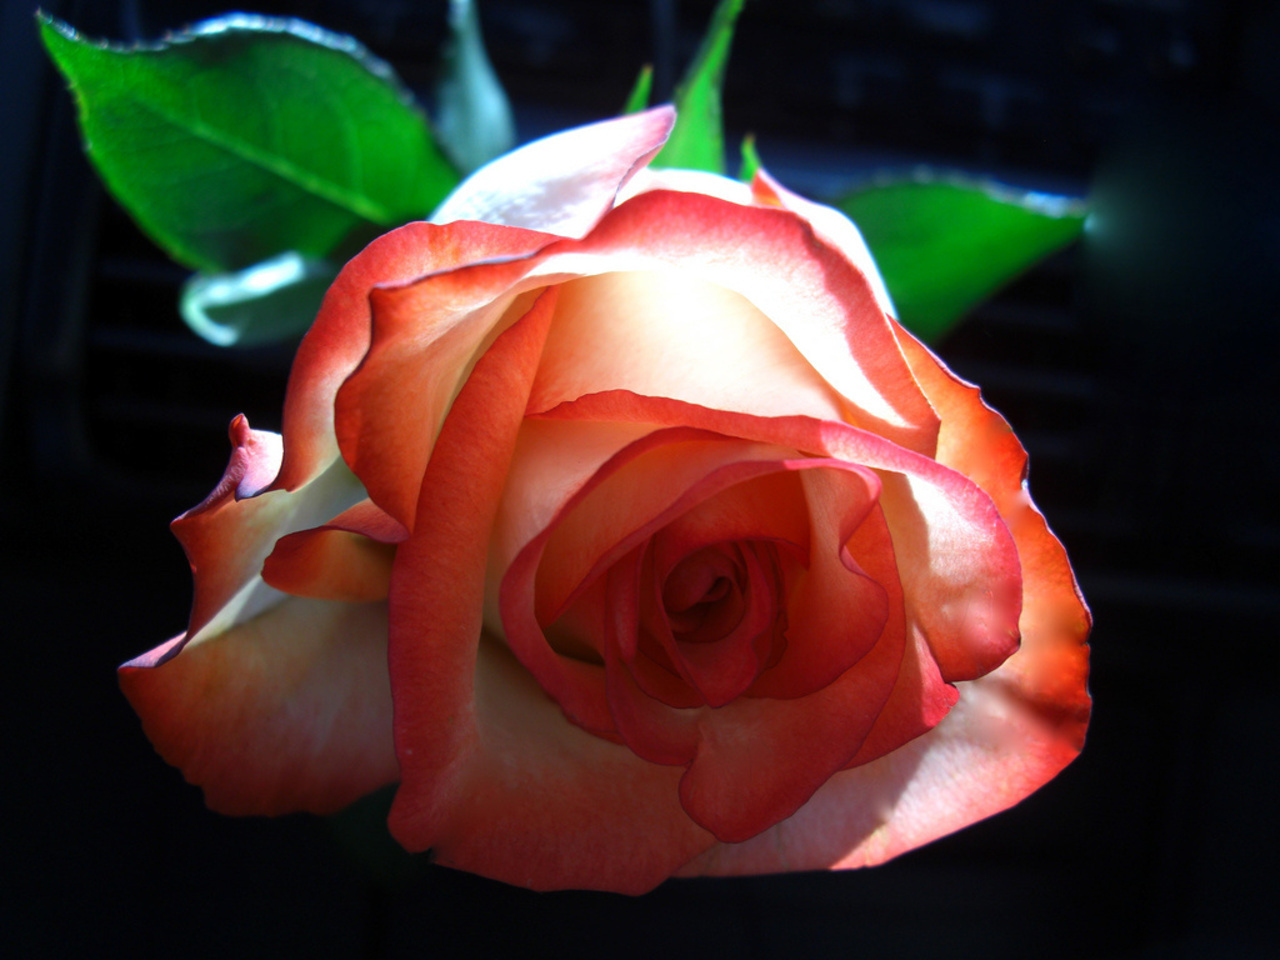 Free Download Beautiful Color Roses Wallpaper 18577533 1280x960 For Your Desktop Mobile Tablet Explore 48 Beautiful Colours Wallpapers Beautiful Rose Wallpapers Pretty Color Wallpaper Beautiful Roses Pictures Wallpapers